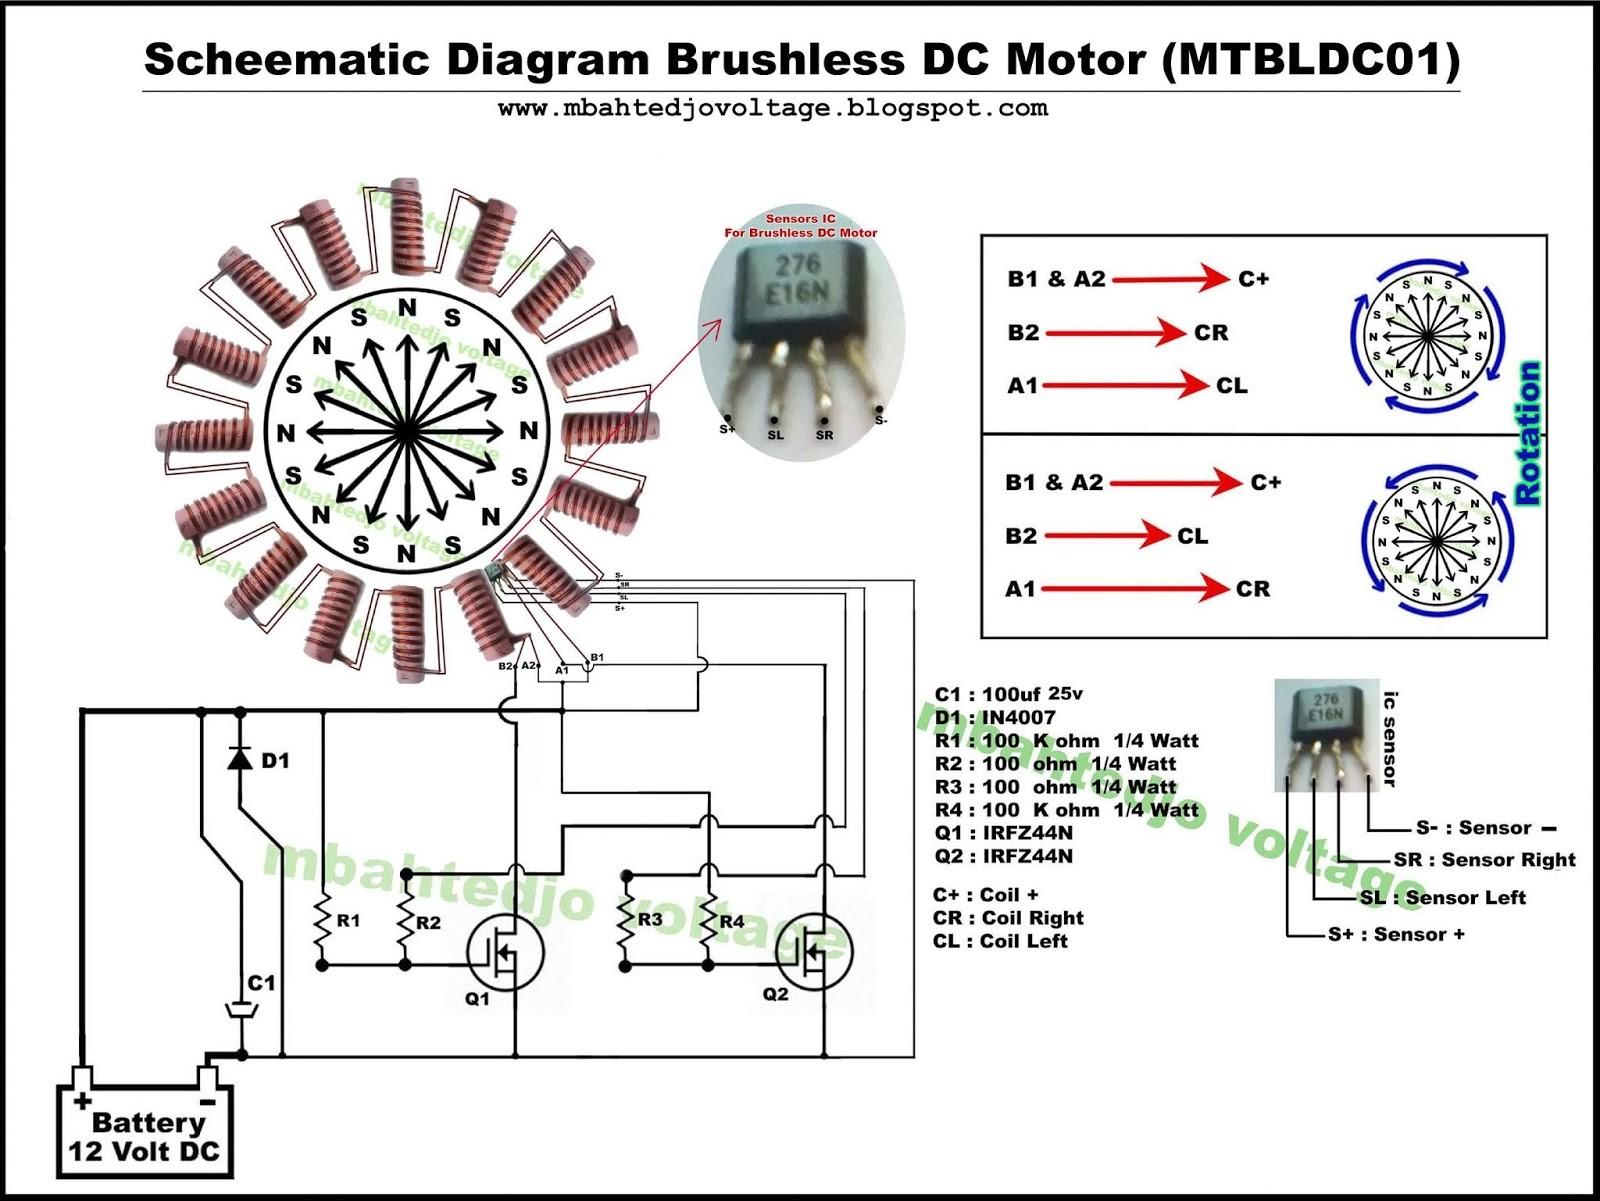 Brushless Dc Motor 12v Diagrama Mbahtedjo Voltage Detail Tutorials How to Make Brushless Dc Motor at Home Of Brushless Dc Motor 12v Diagrama